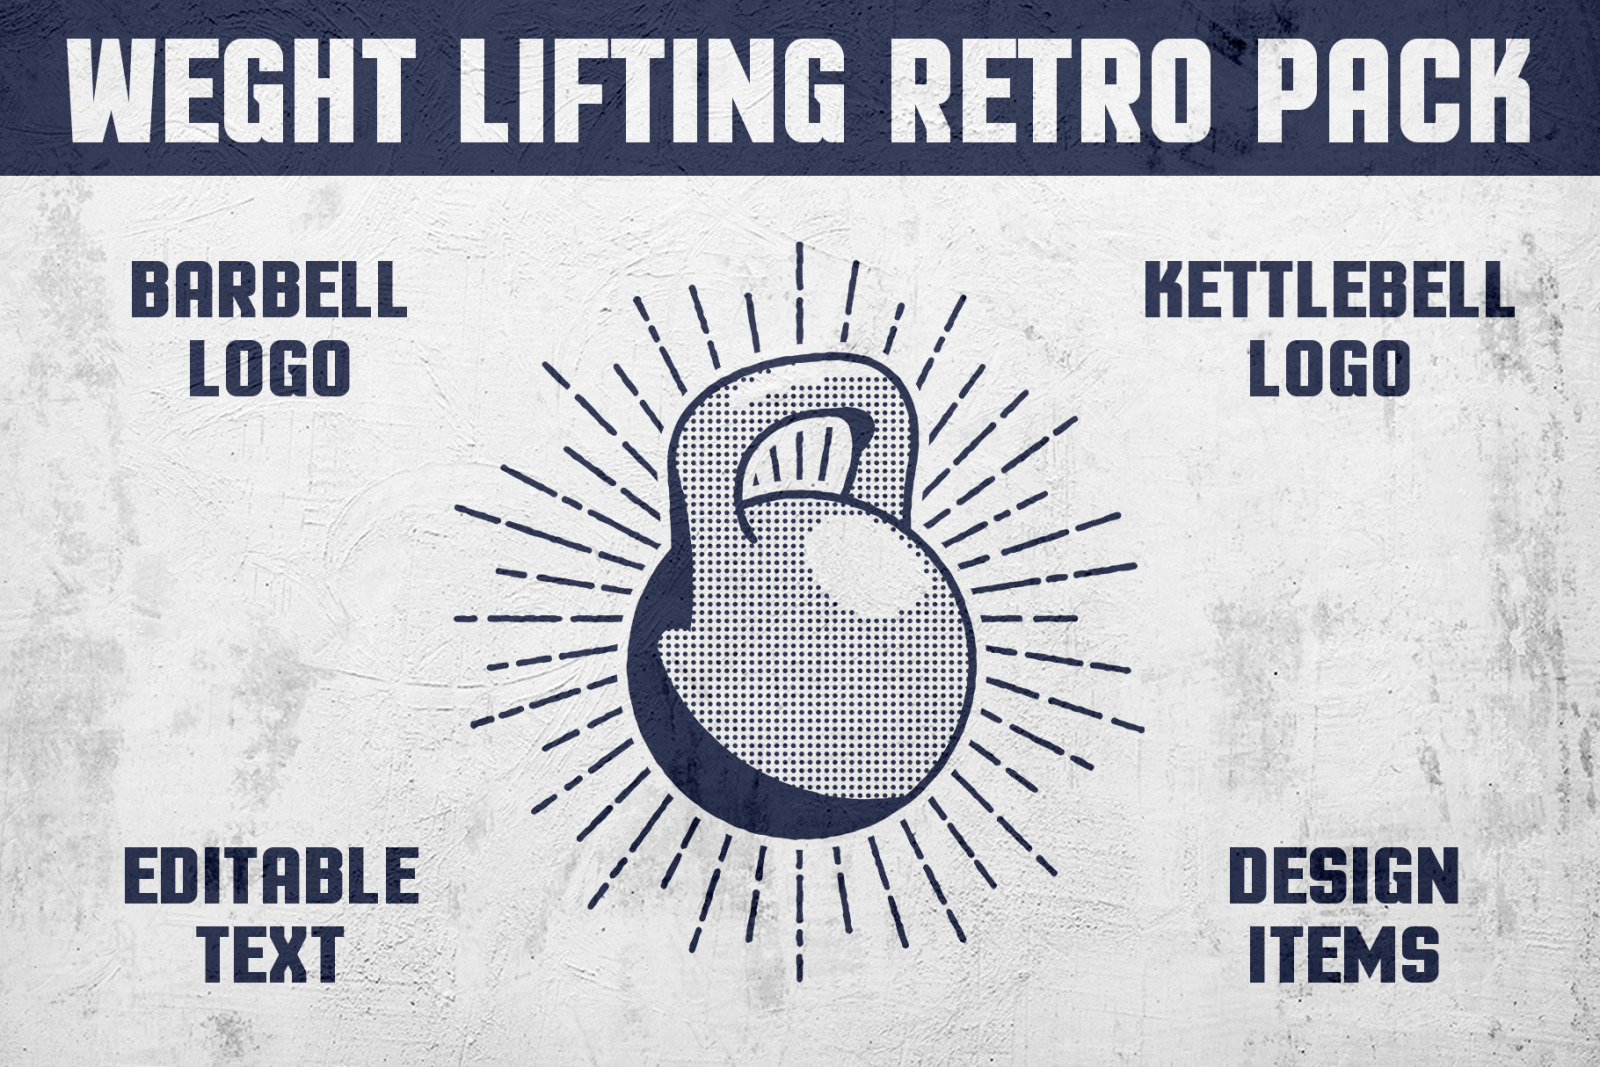 Weight Lifting Retro Pack